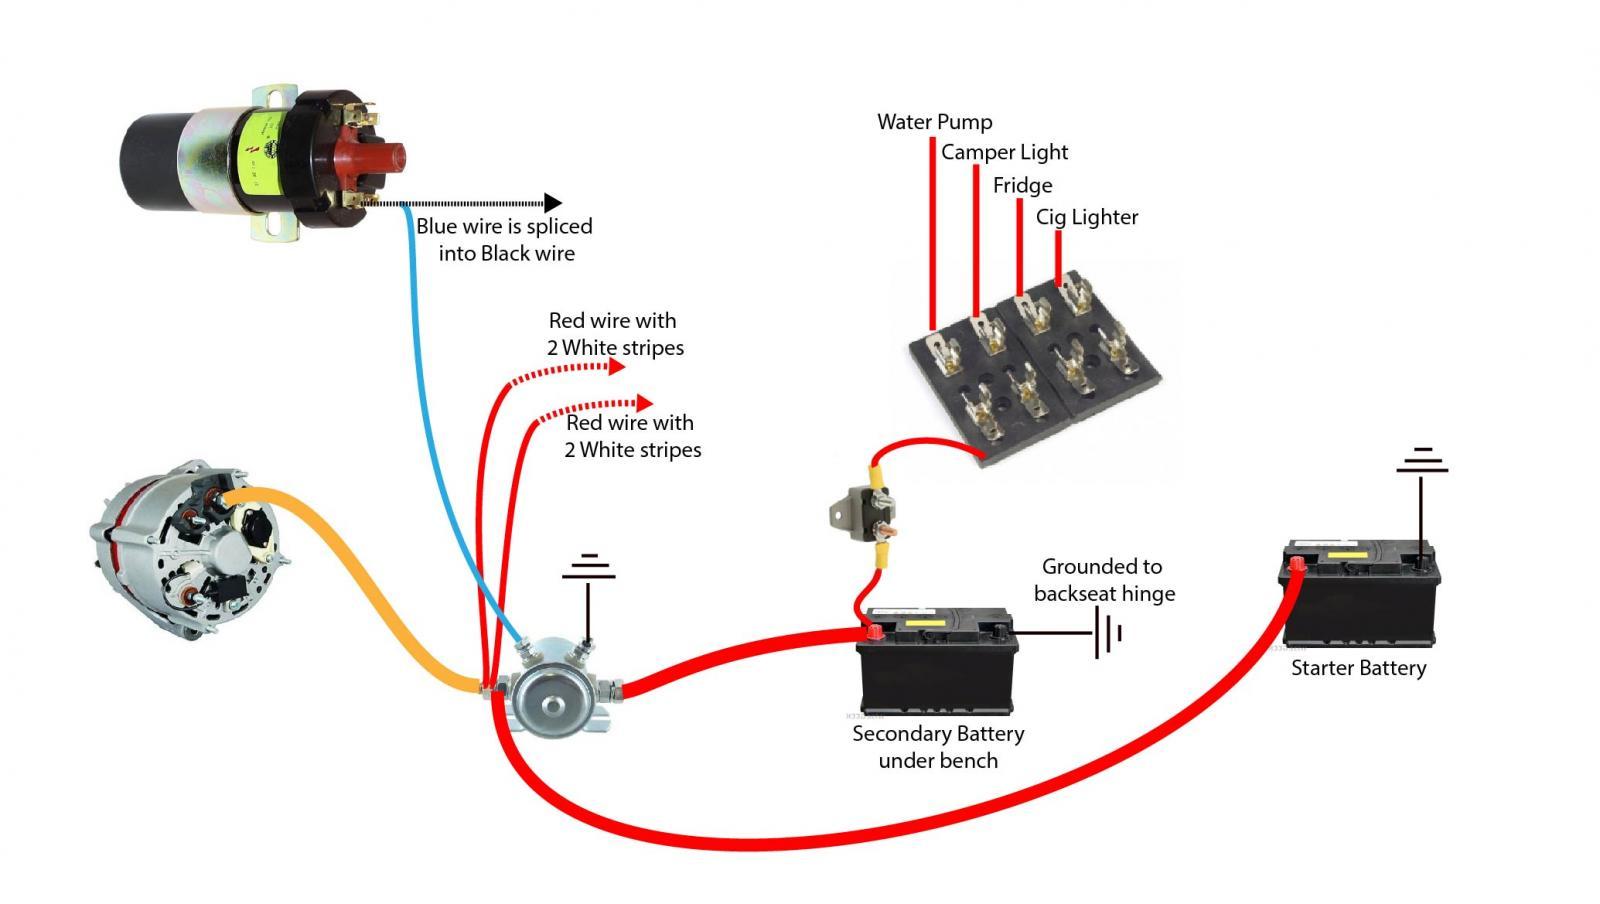 Vanagon Aux Battery Wiring Diagram | Wiring Schematic Diagram on 85 vanagon fuse diagram, vanagon westfalia, vanagon interior light wiring repair,